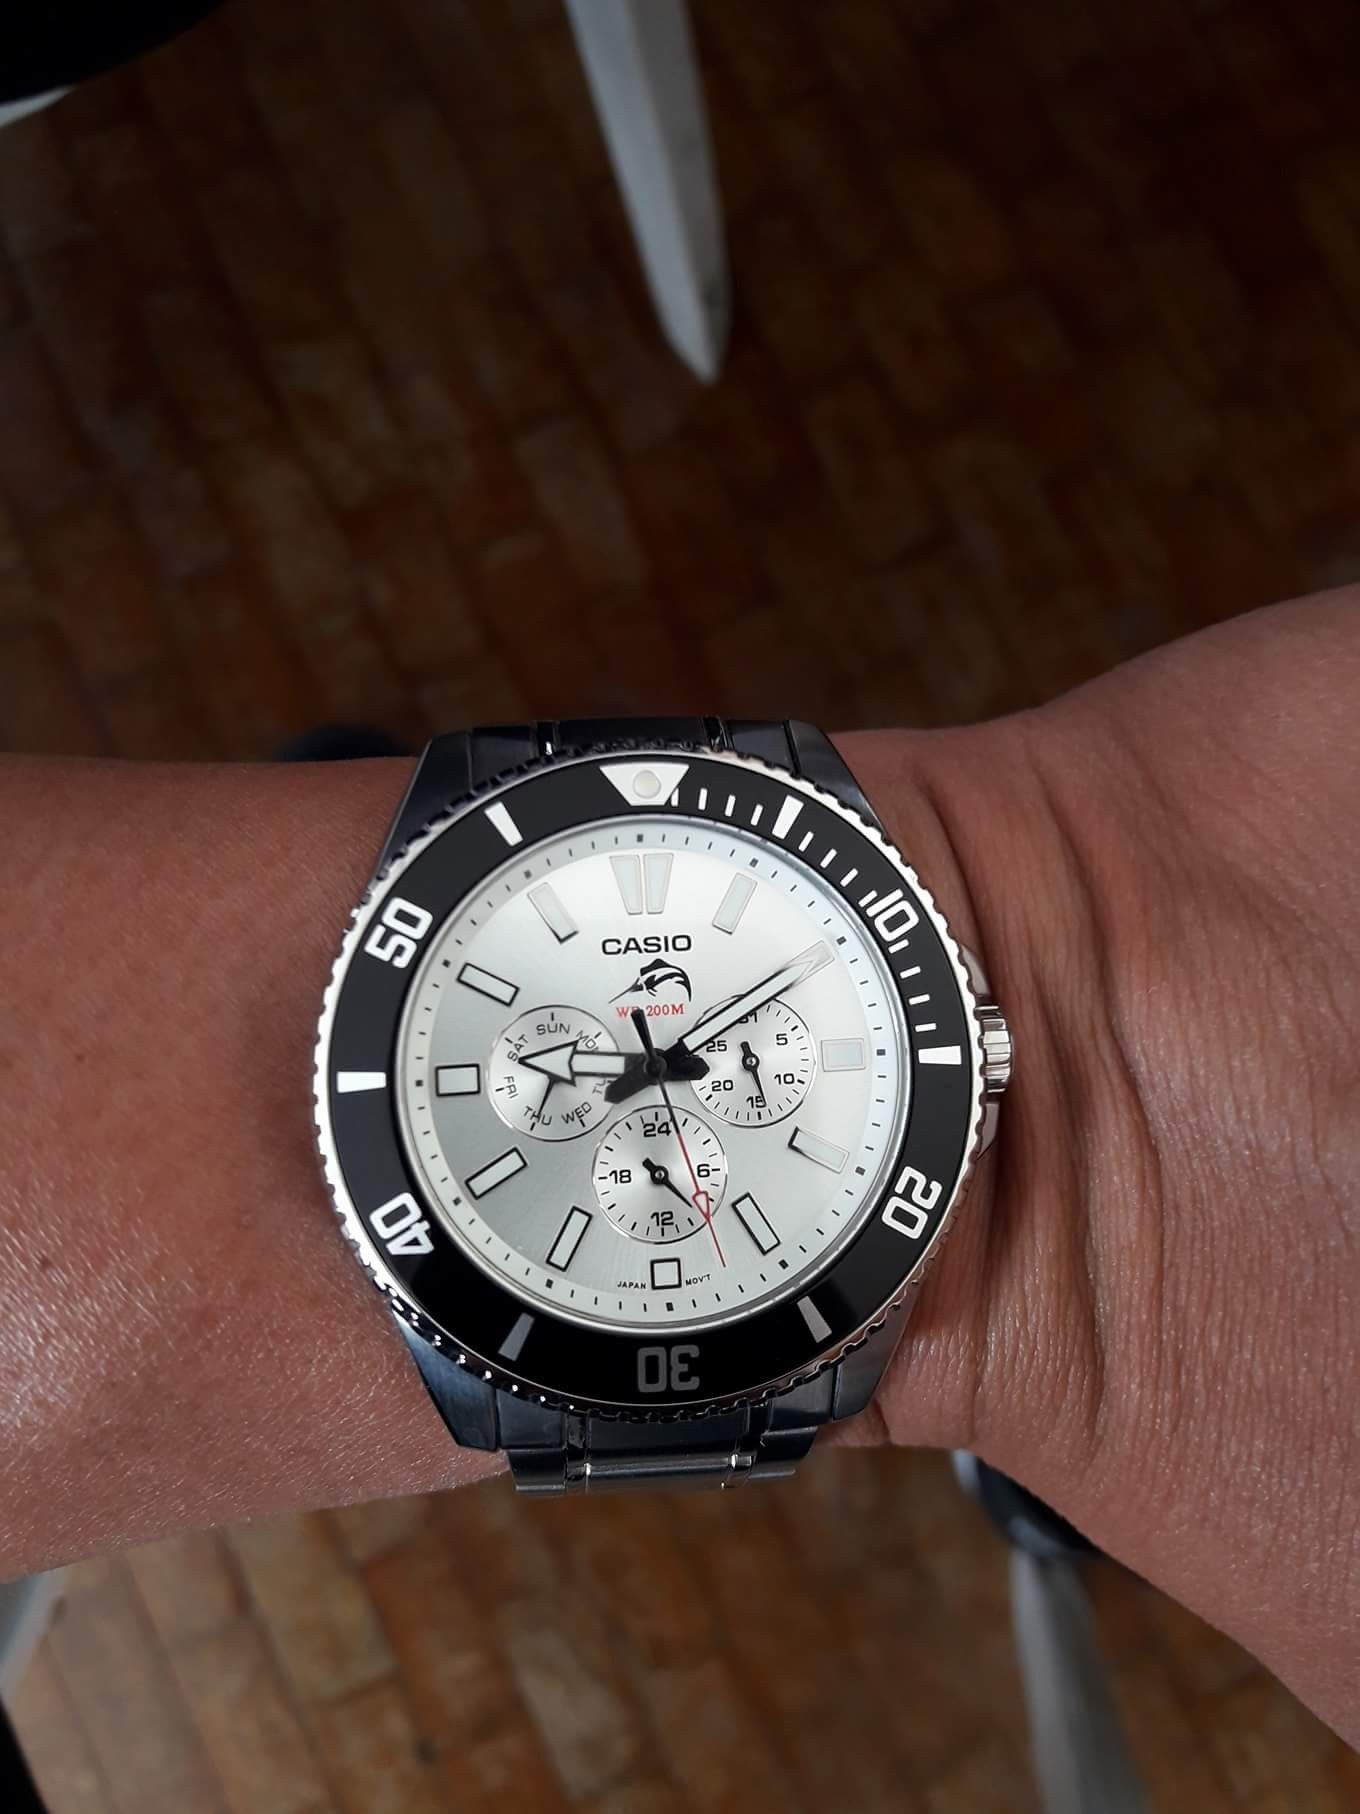 a70a22f0b847 Casio Duro 200 MDV-303 Sunburst White dial